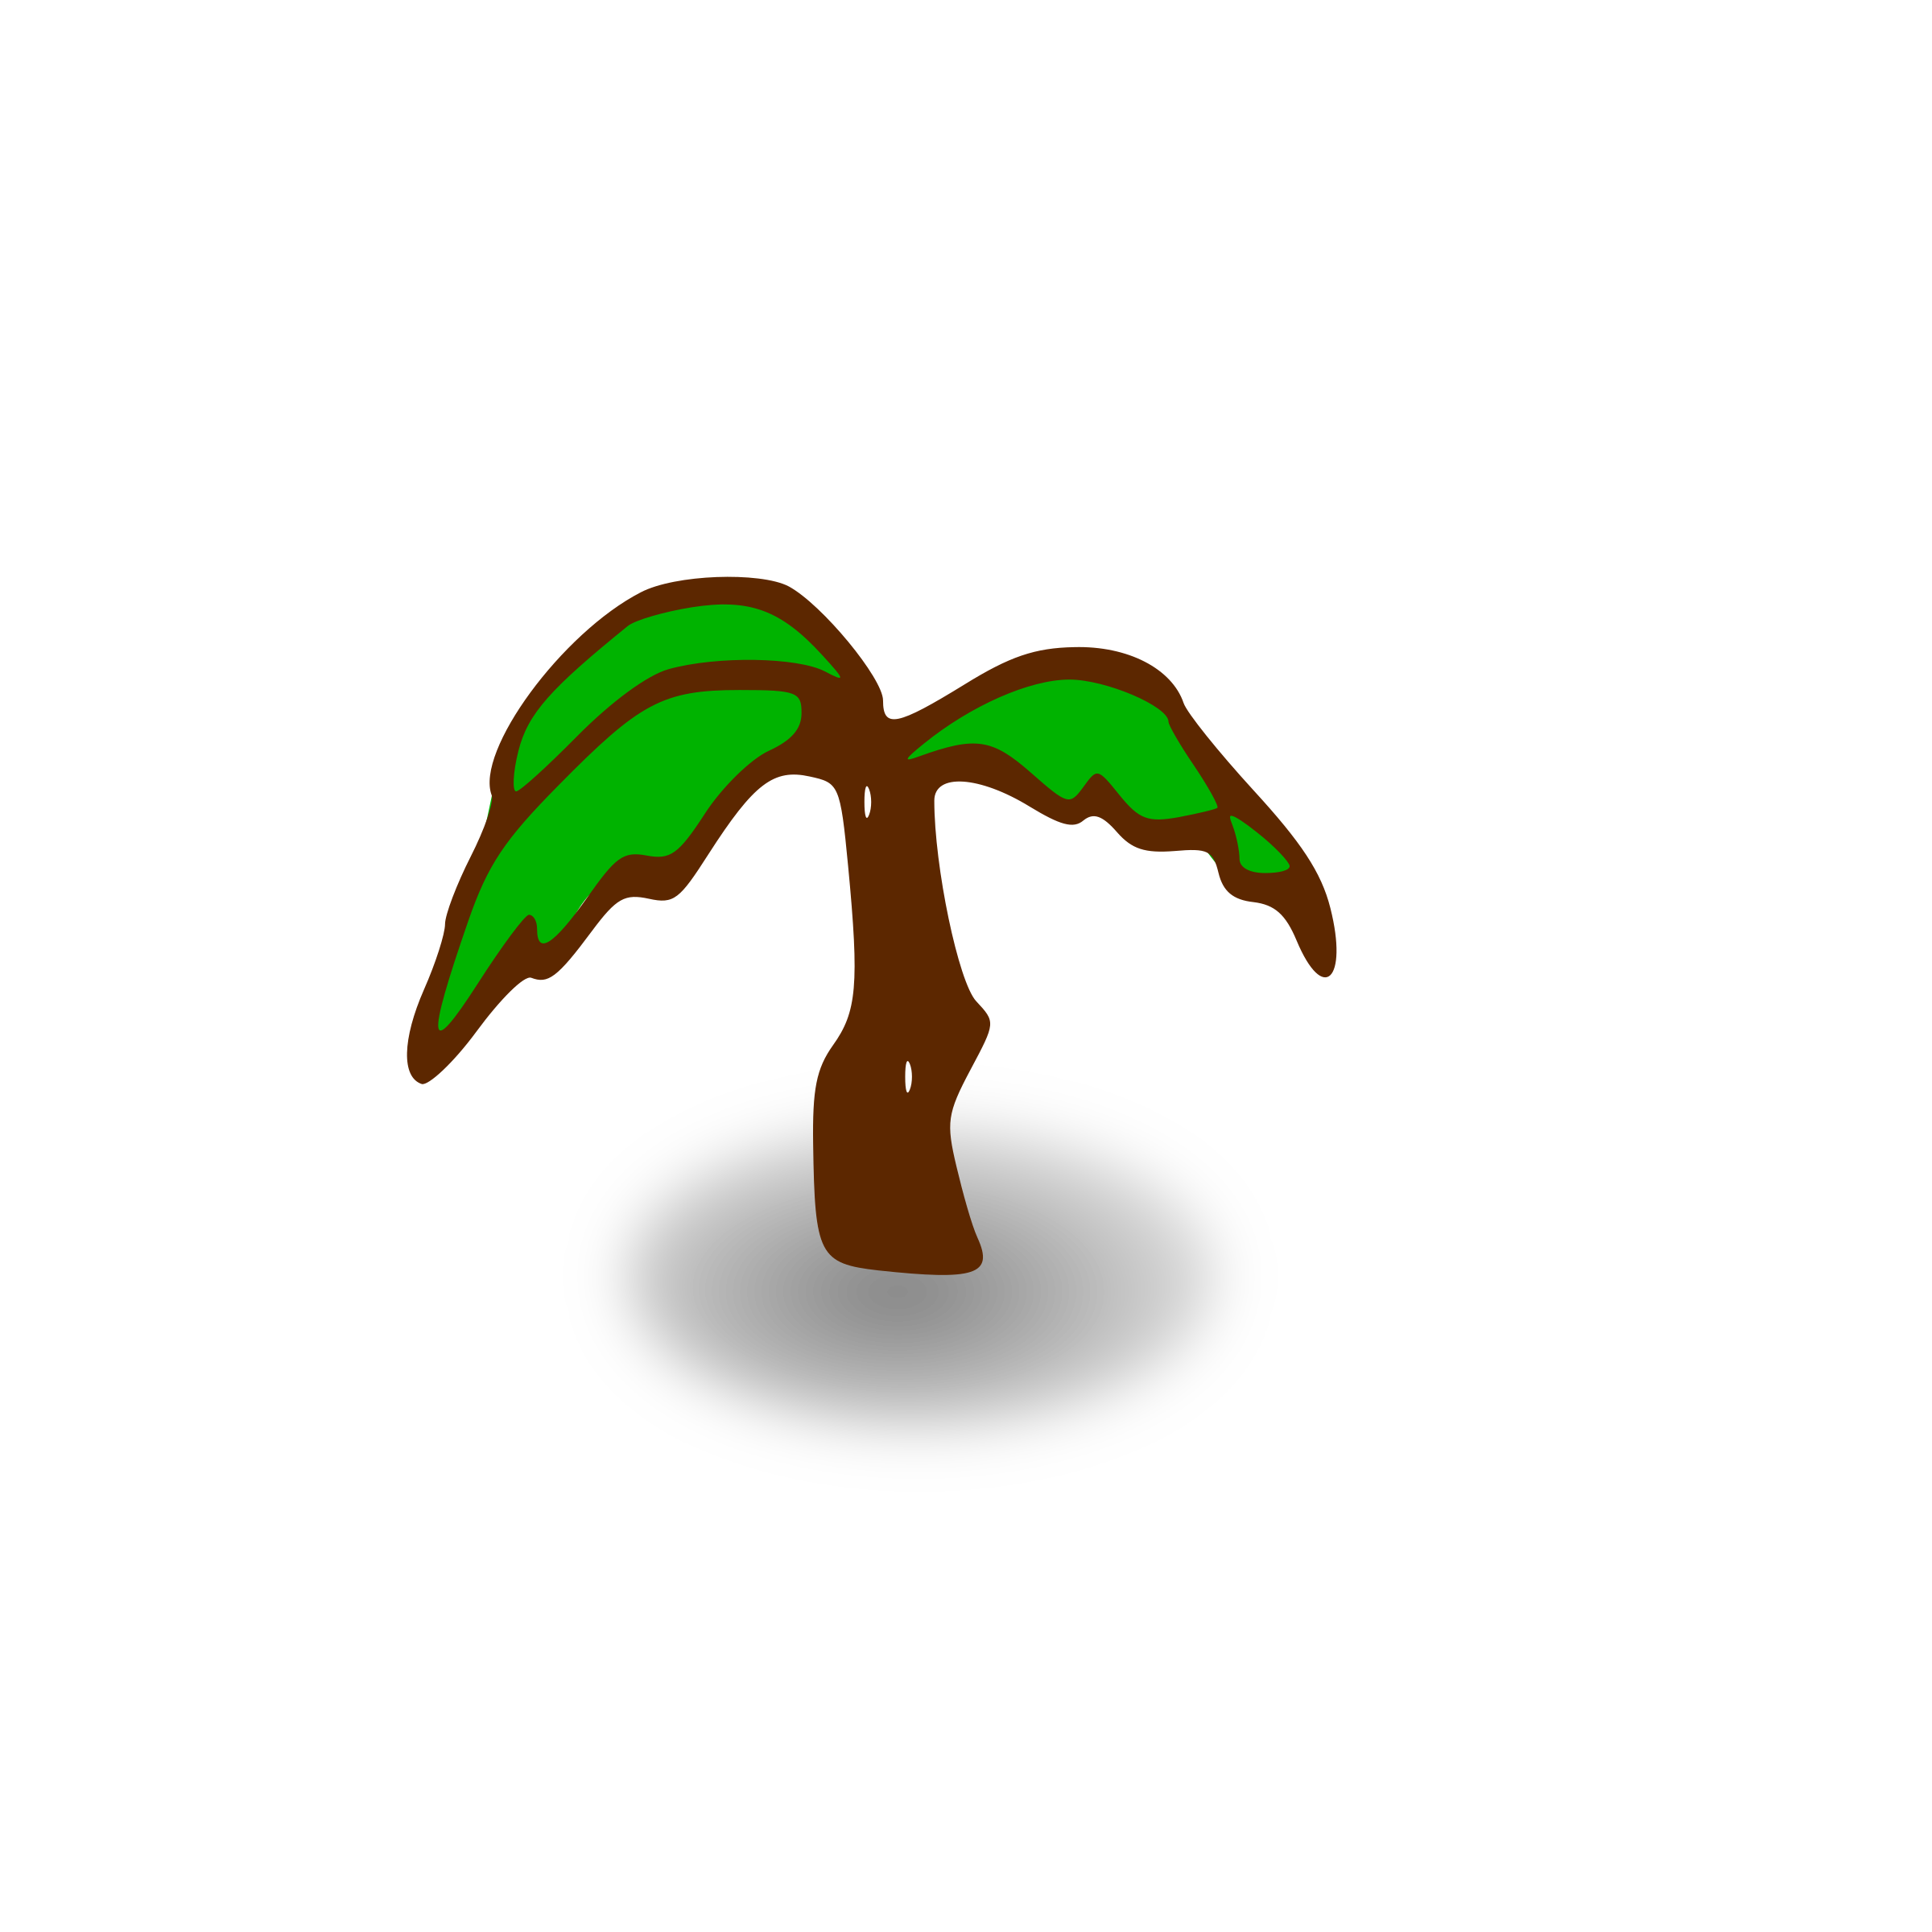 Clipart Rpg Map Symbols Palm Tree